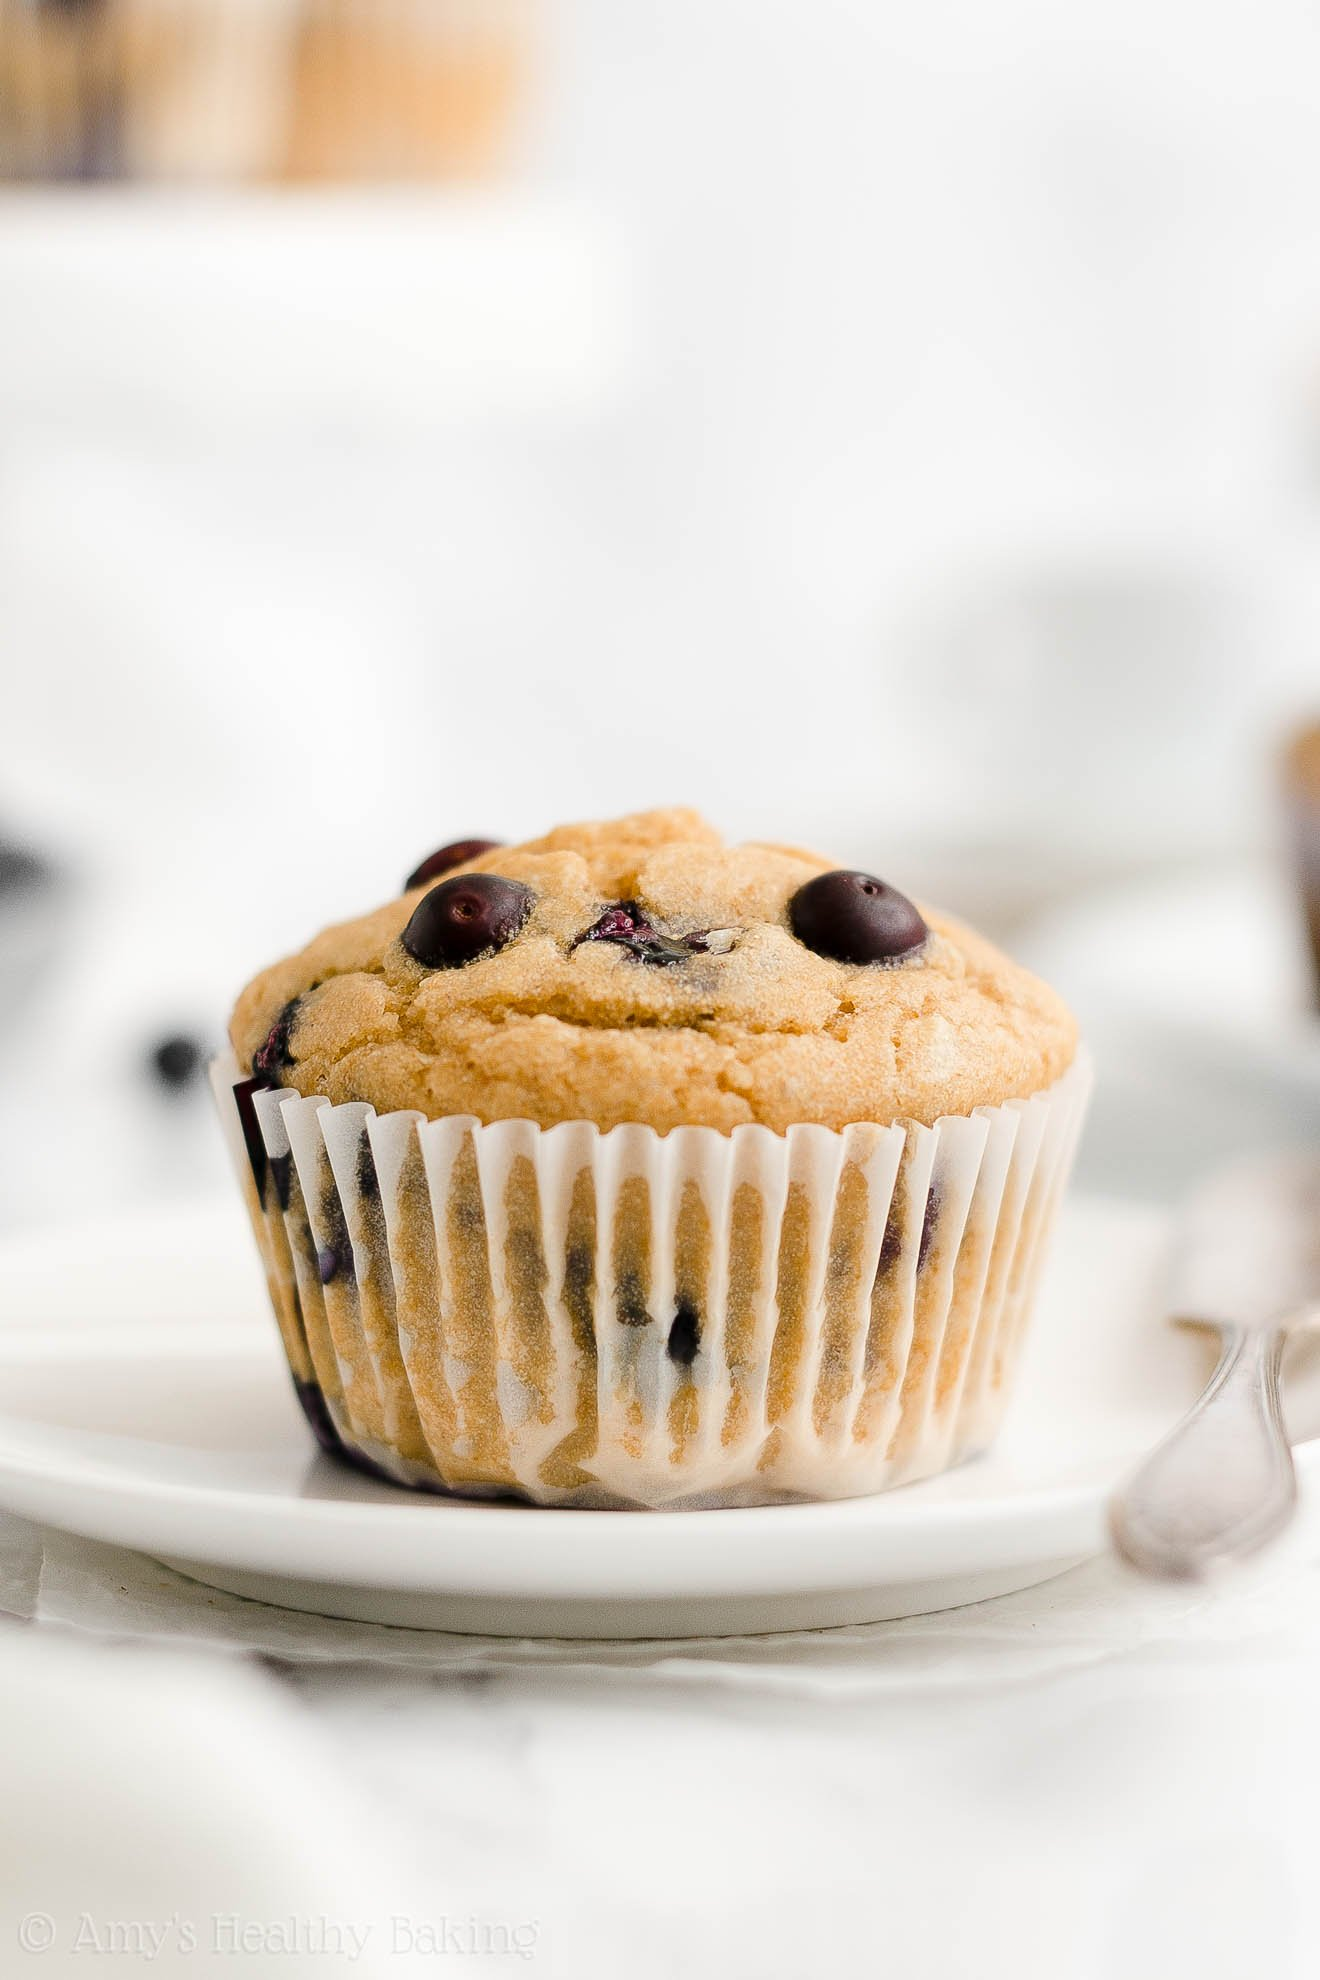 ULTIMATE Best Easy Healthy Gluten Free Low Sugar Yogurt Blueberry Muffins